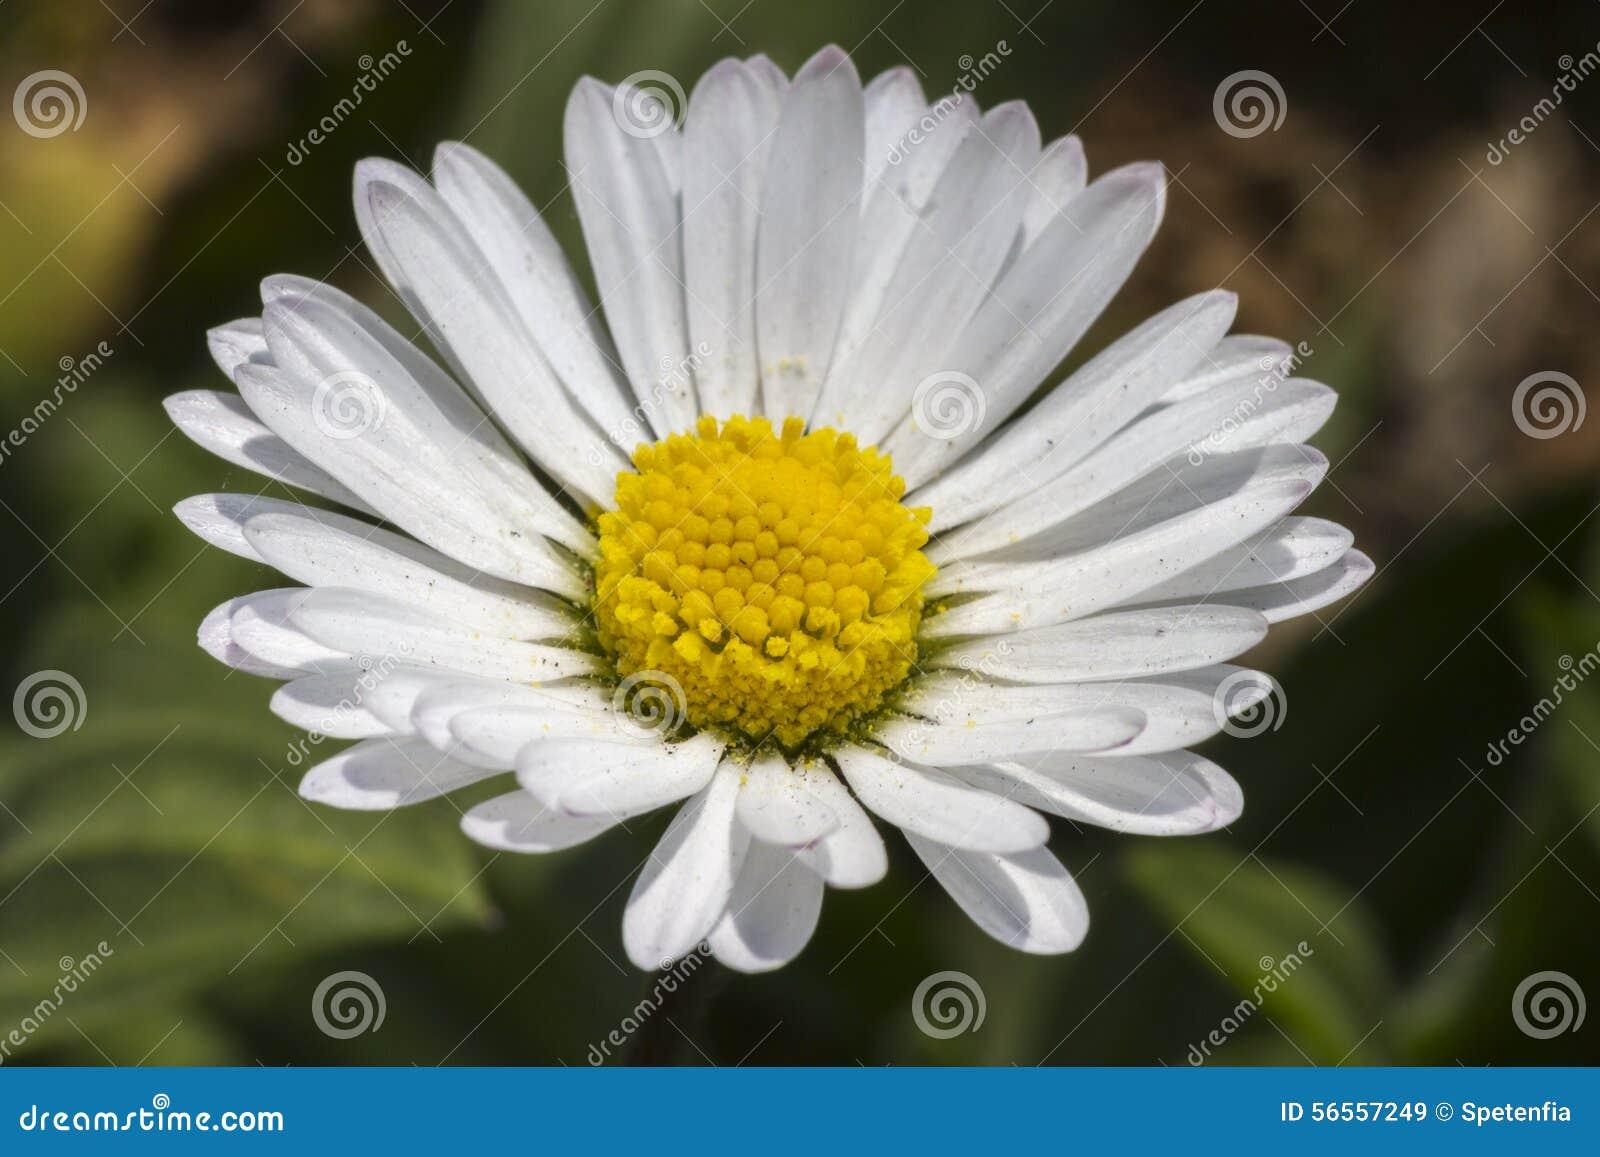 Download Daisy στον κήπο στοκ εικόνα. εικόνα από φύλλο, οίστρο - 56557249